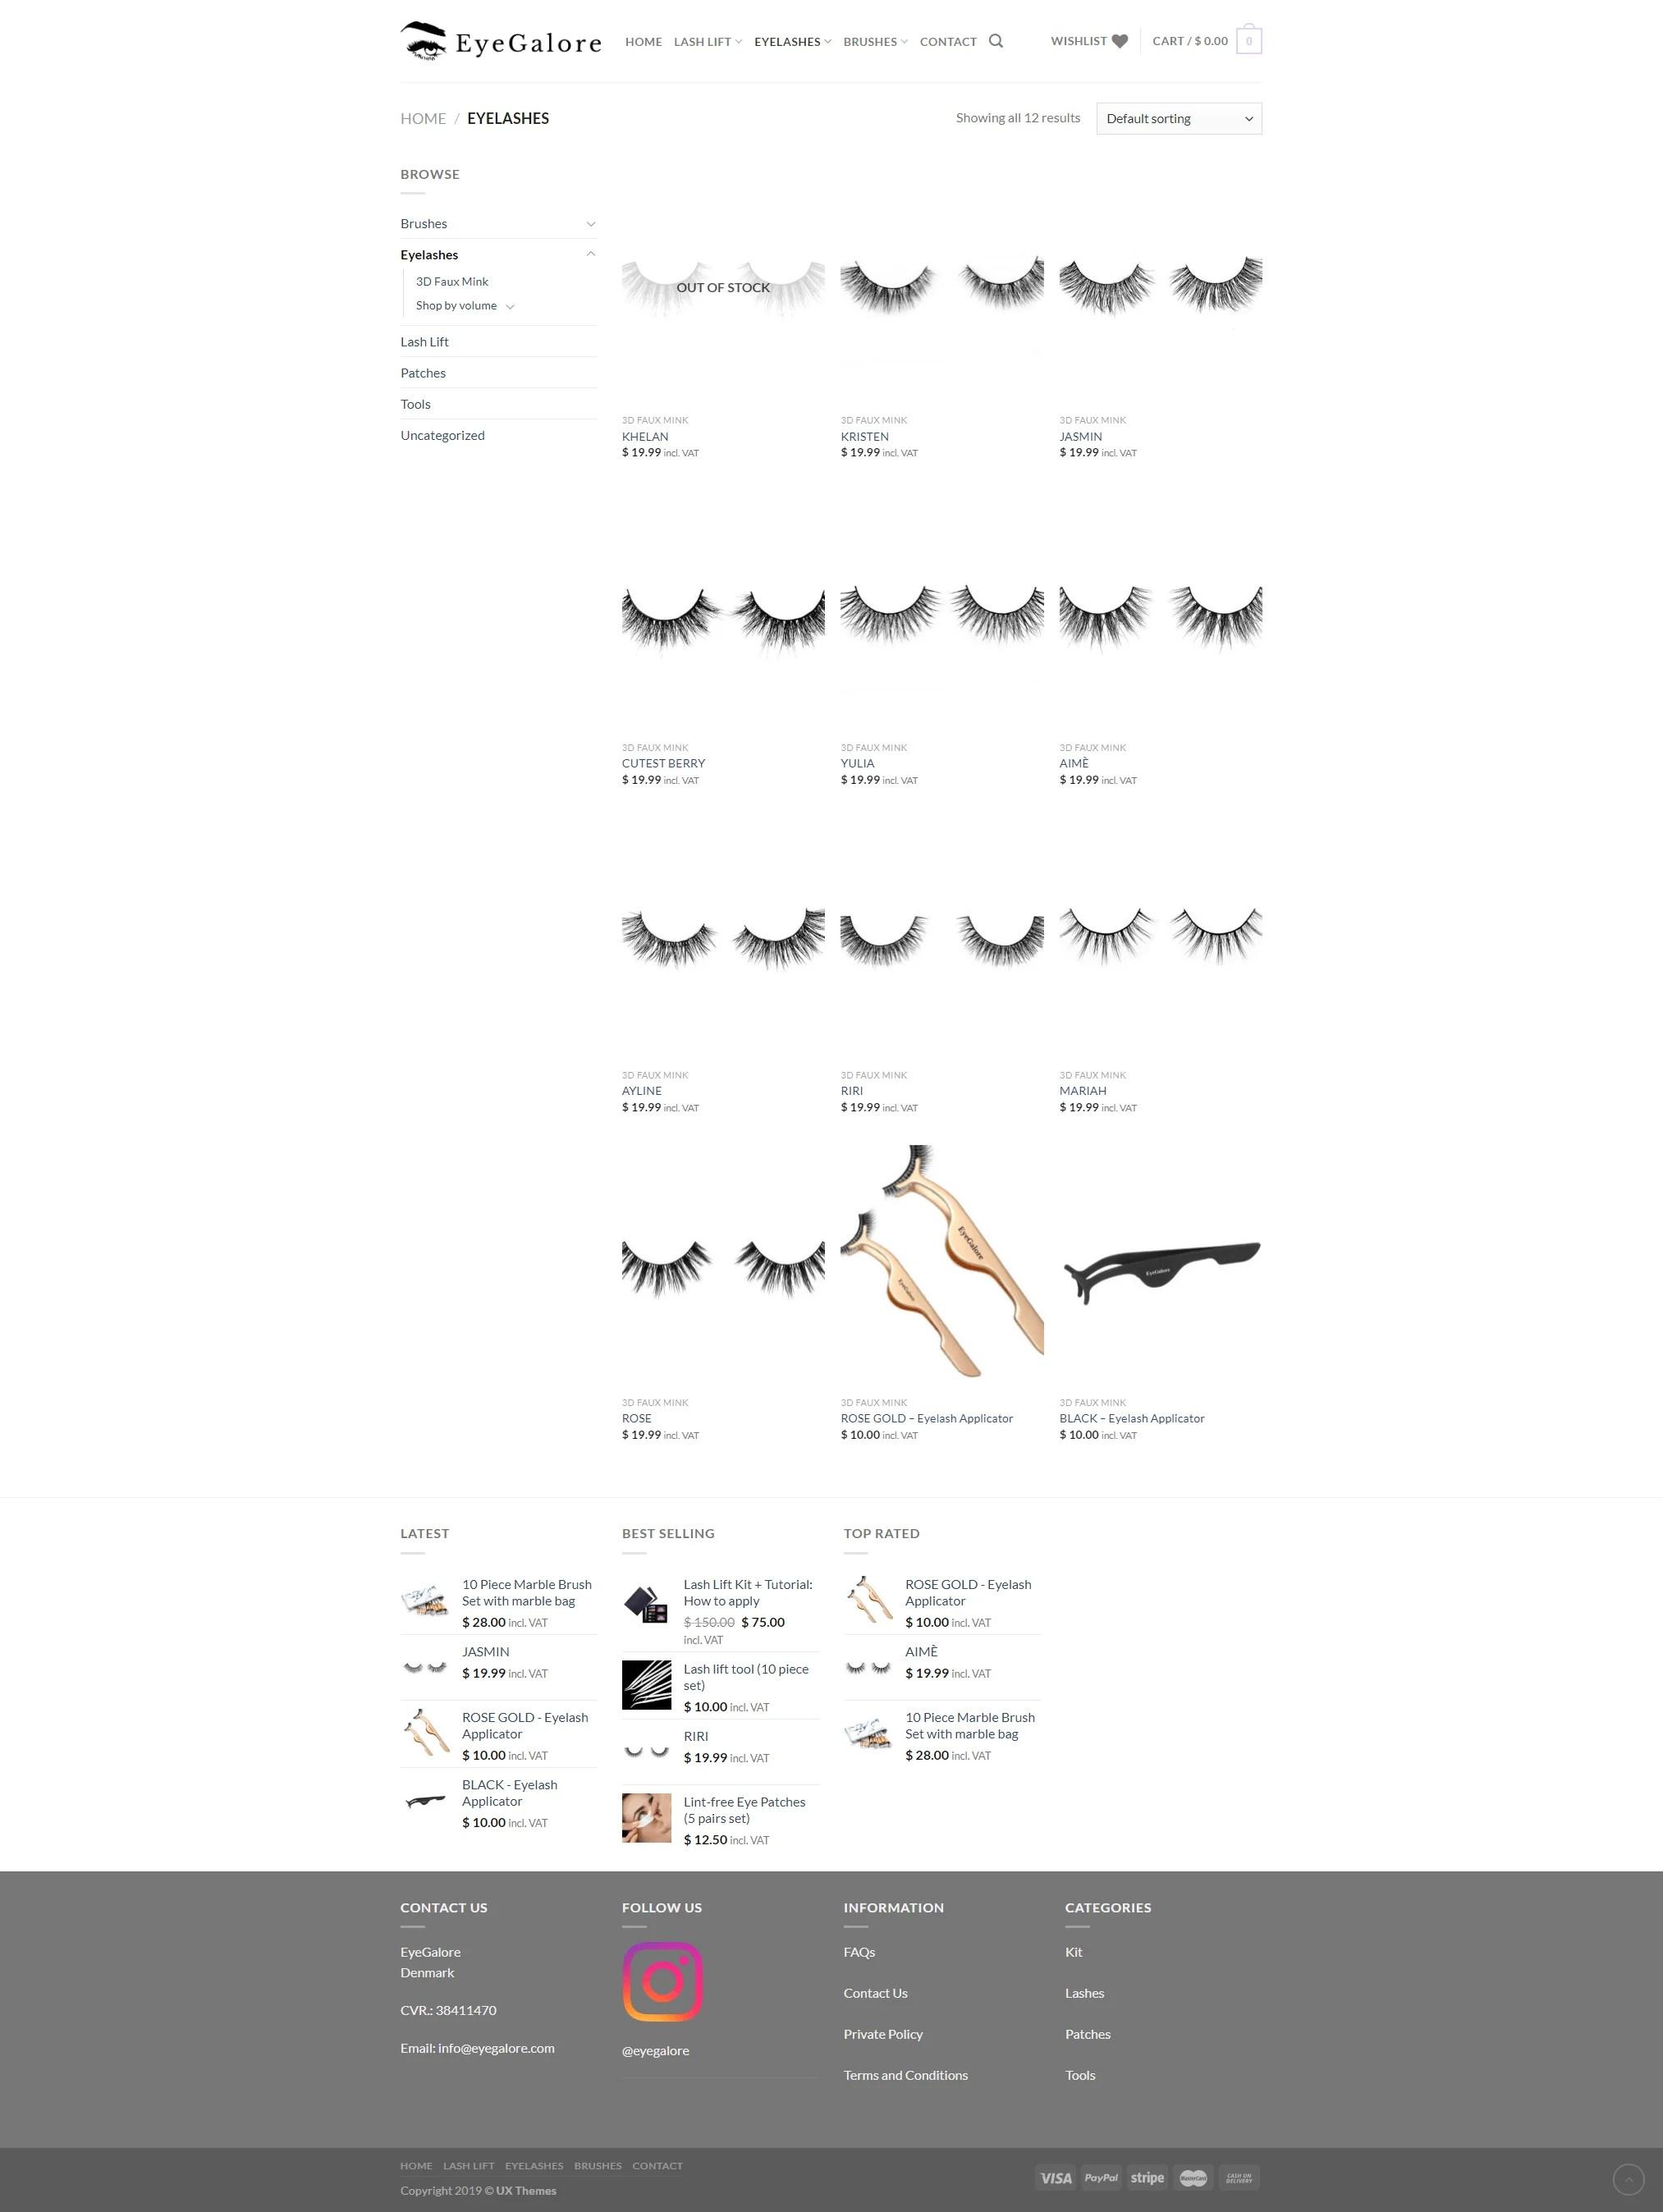 eyegalore_1